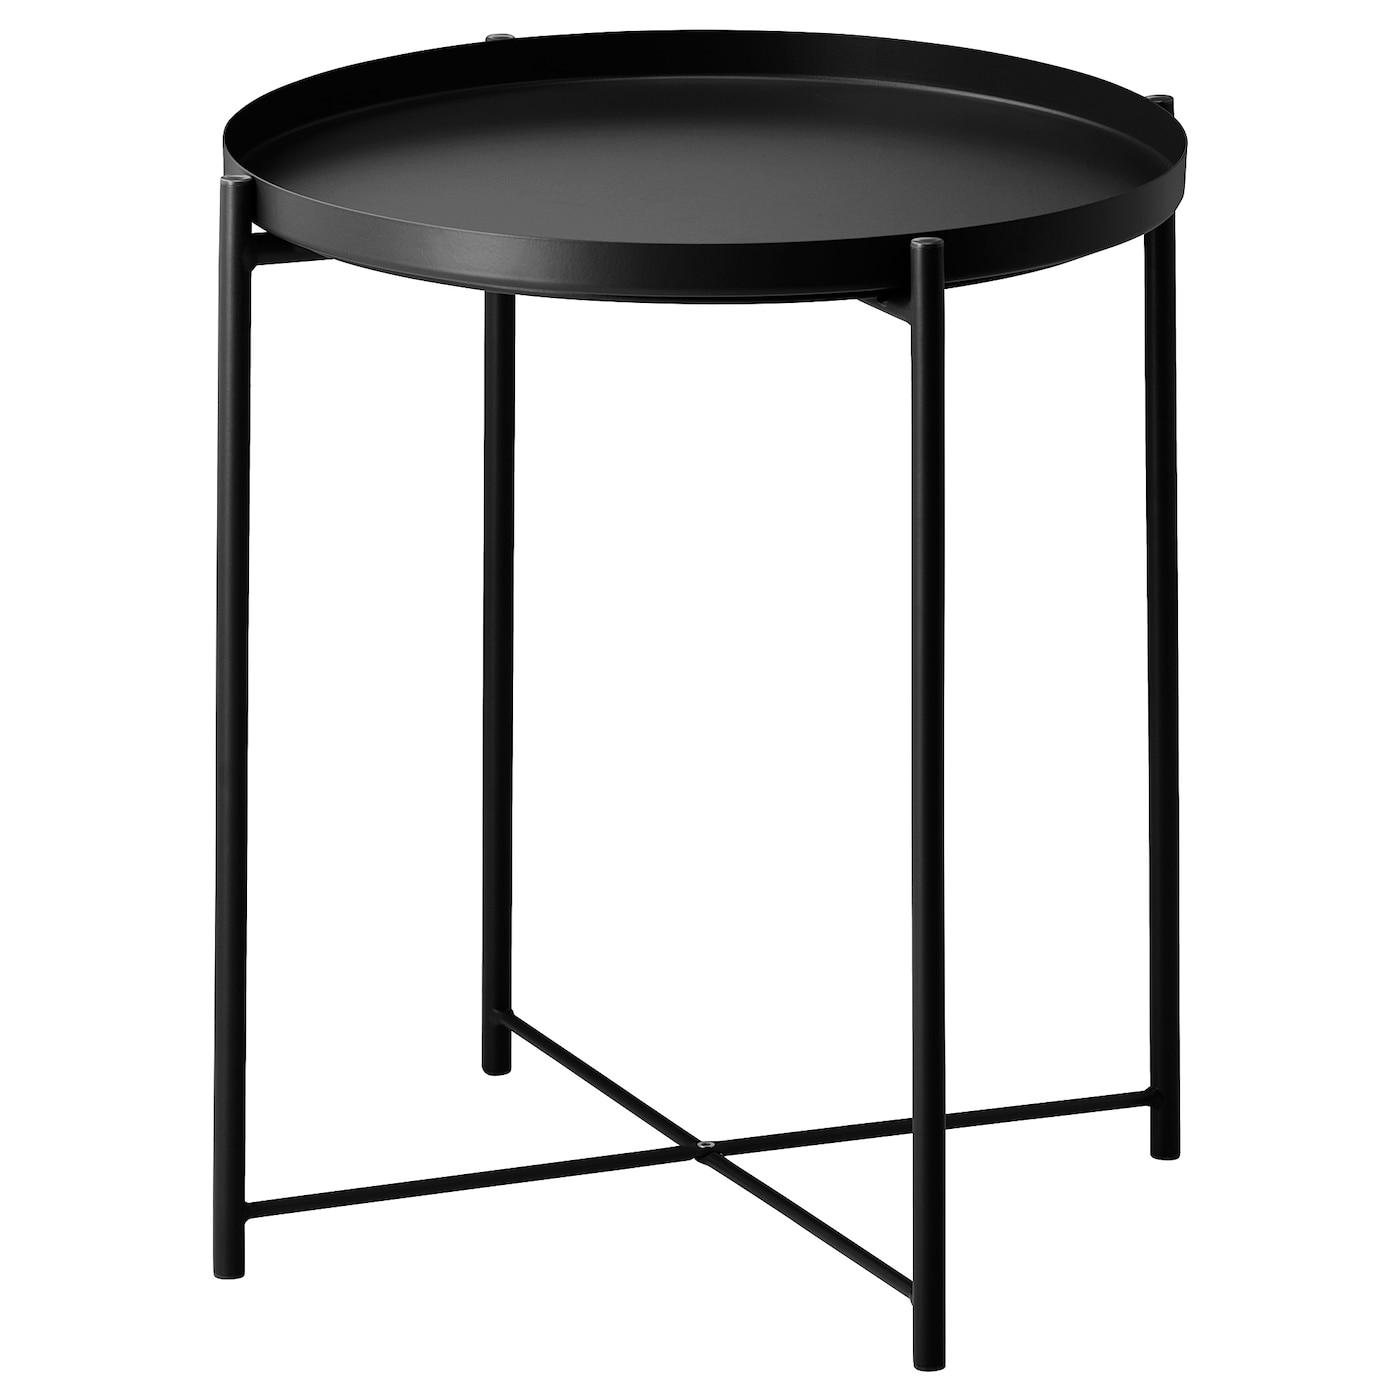 Gladom Tray Table Black 17 1 2x20 5 8